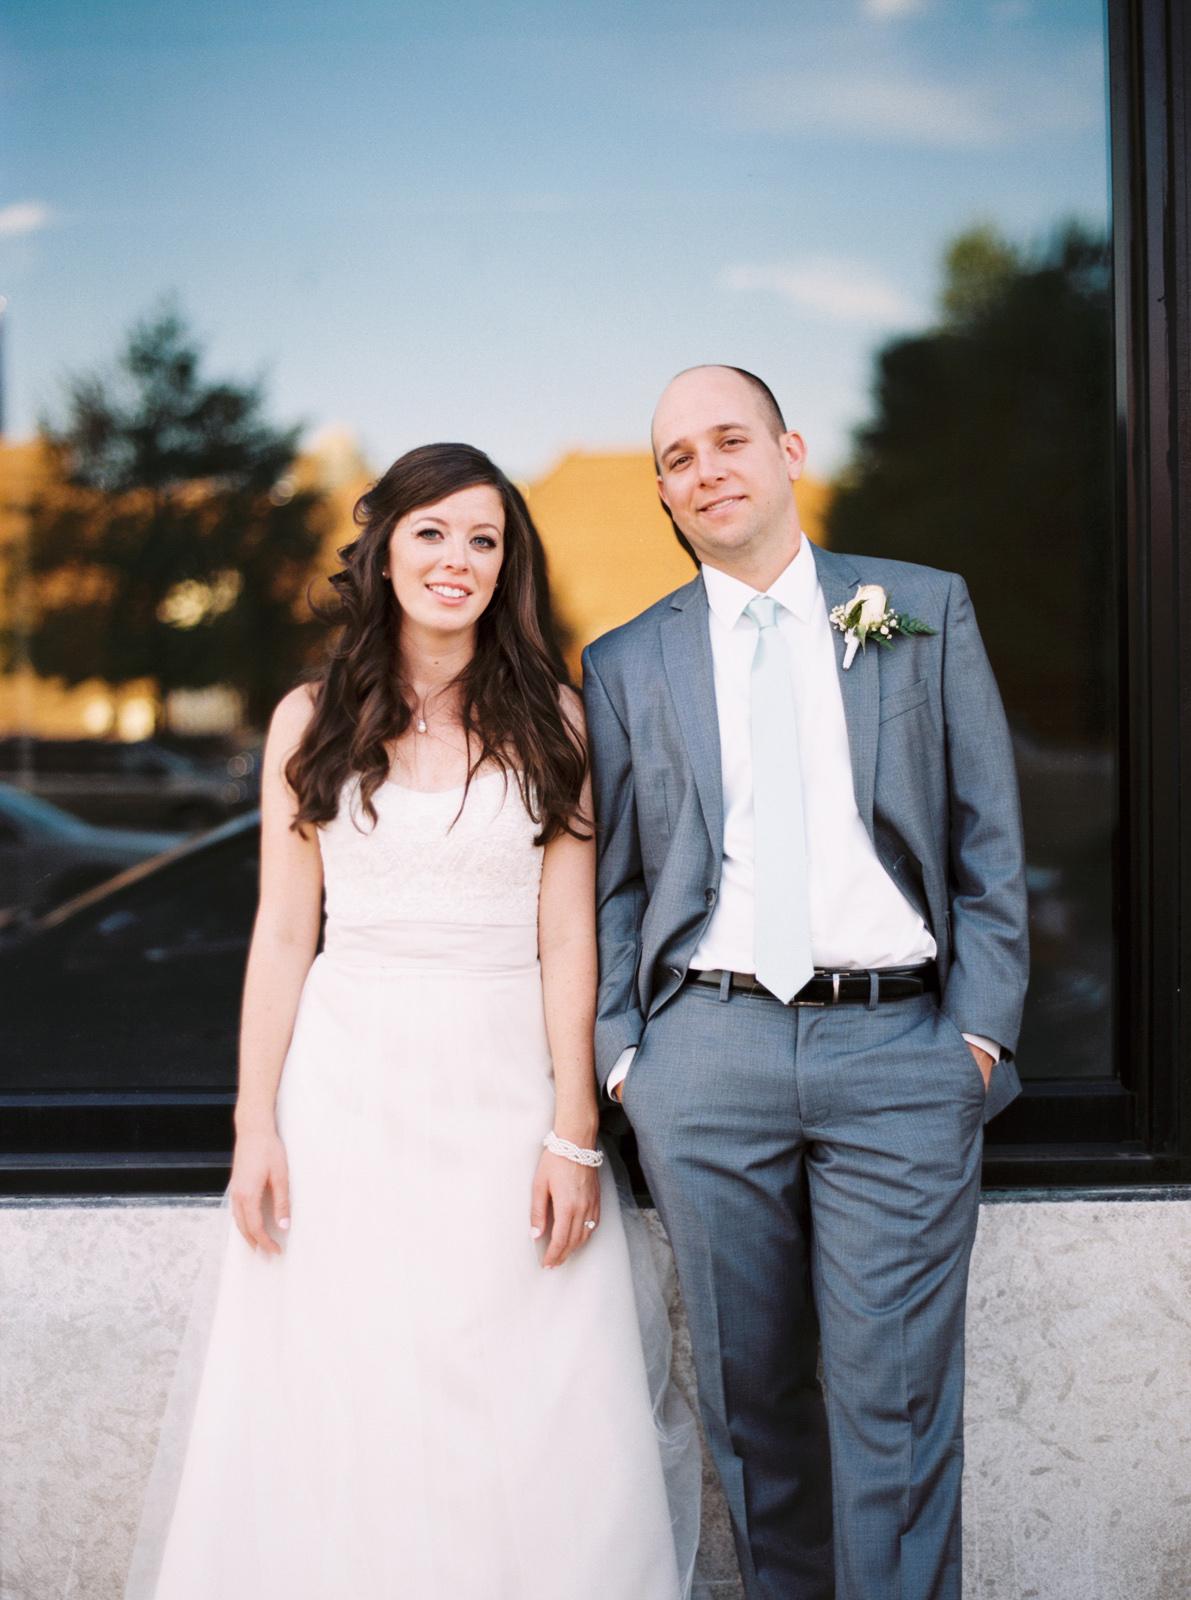 Oldani-Photography-St-Louis-Film-Photographer-Schlafly-Tap-Room-Wedding-Reception8603_03.jpg